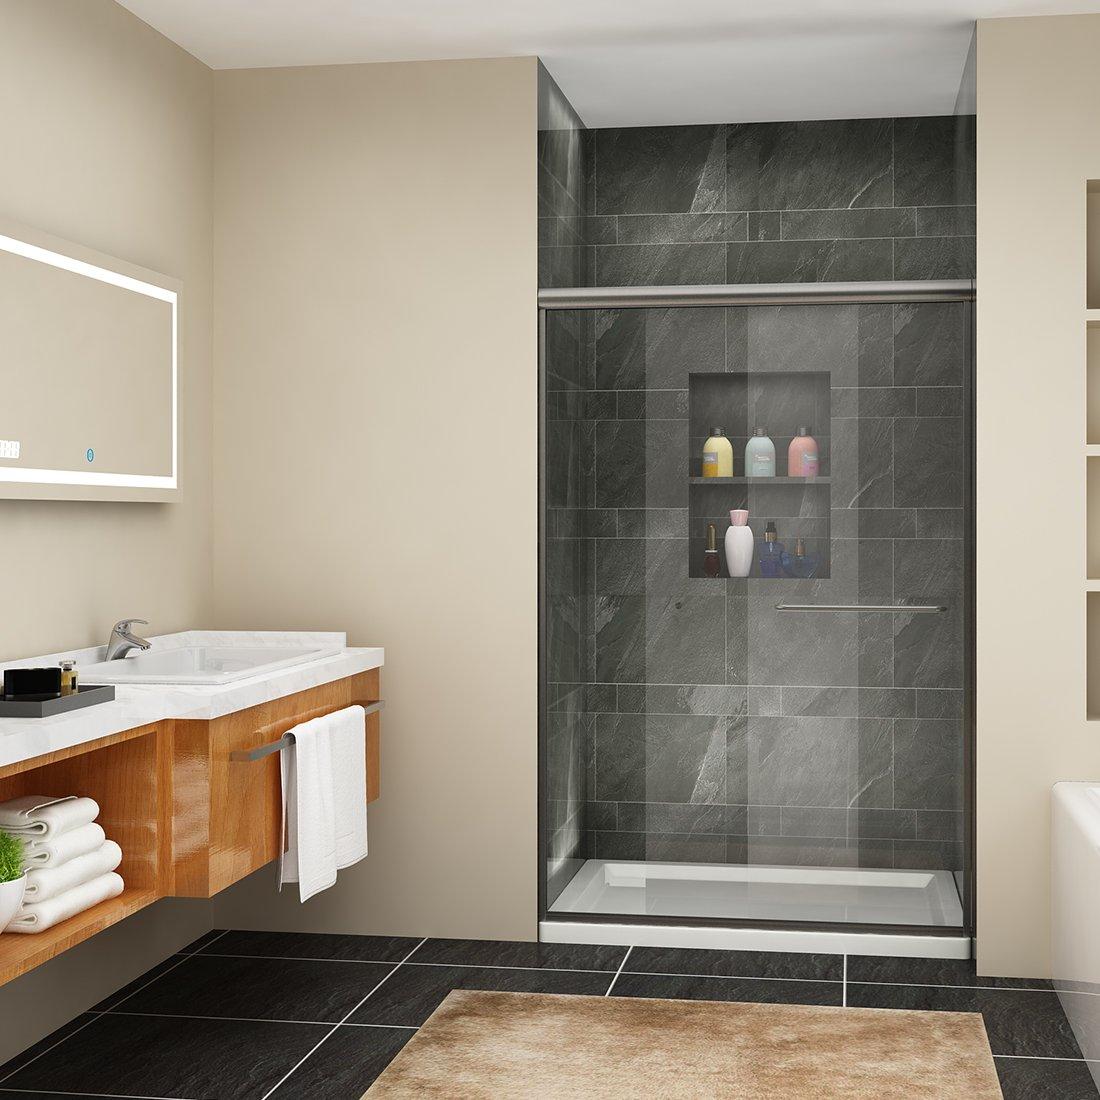 SUNNY SHOWER B020 Semi-Frameless Bypass Sliding Shower Doors, 44'' - 48'' W x 72'' H, 1/4'' Clear Glass, Brushed Nickel Finish